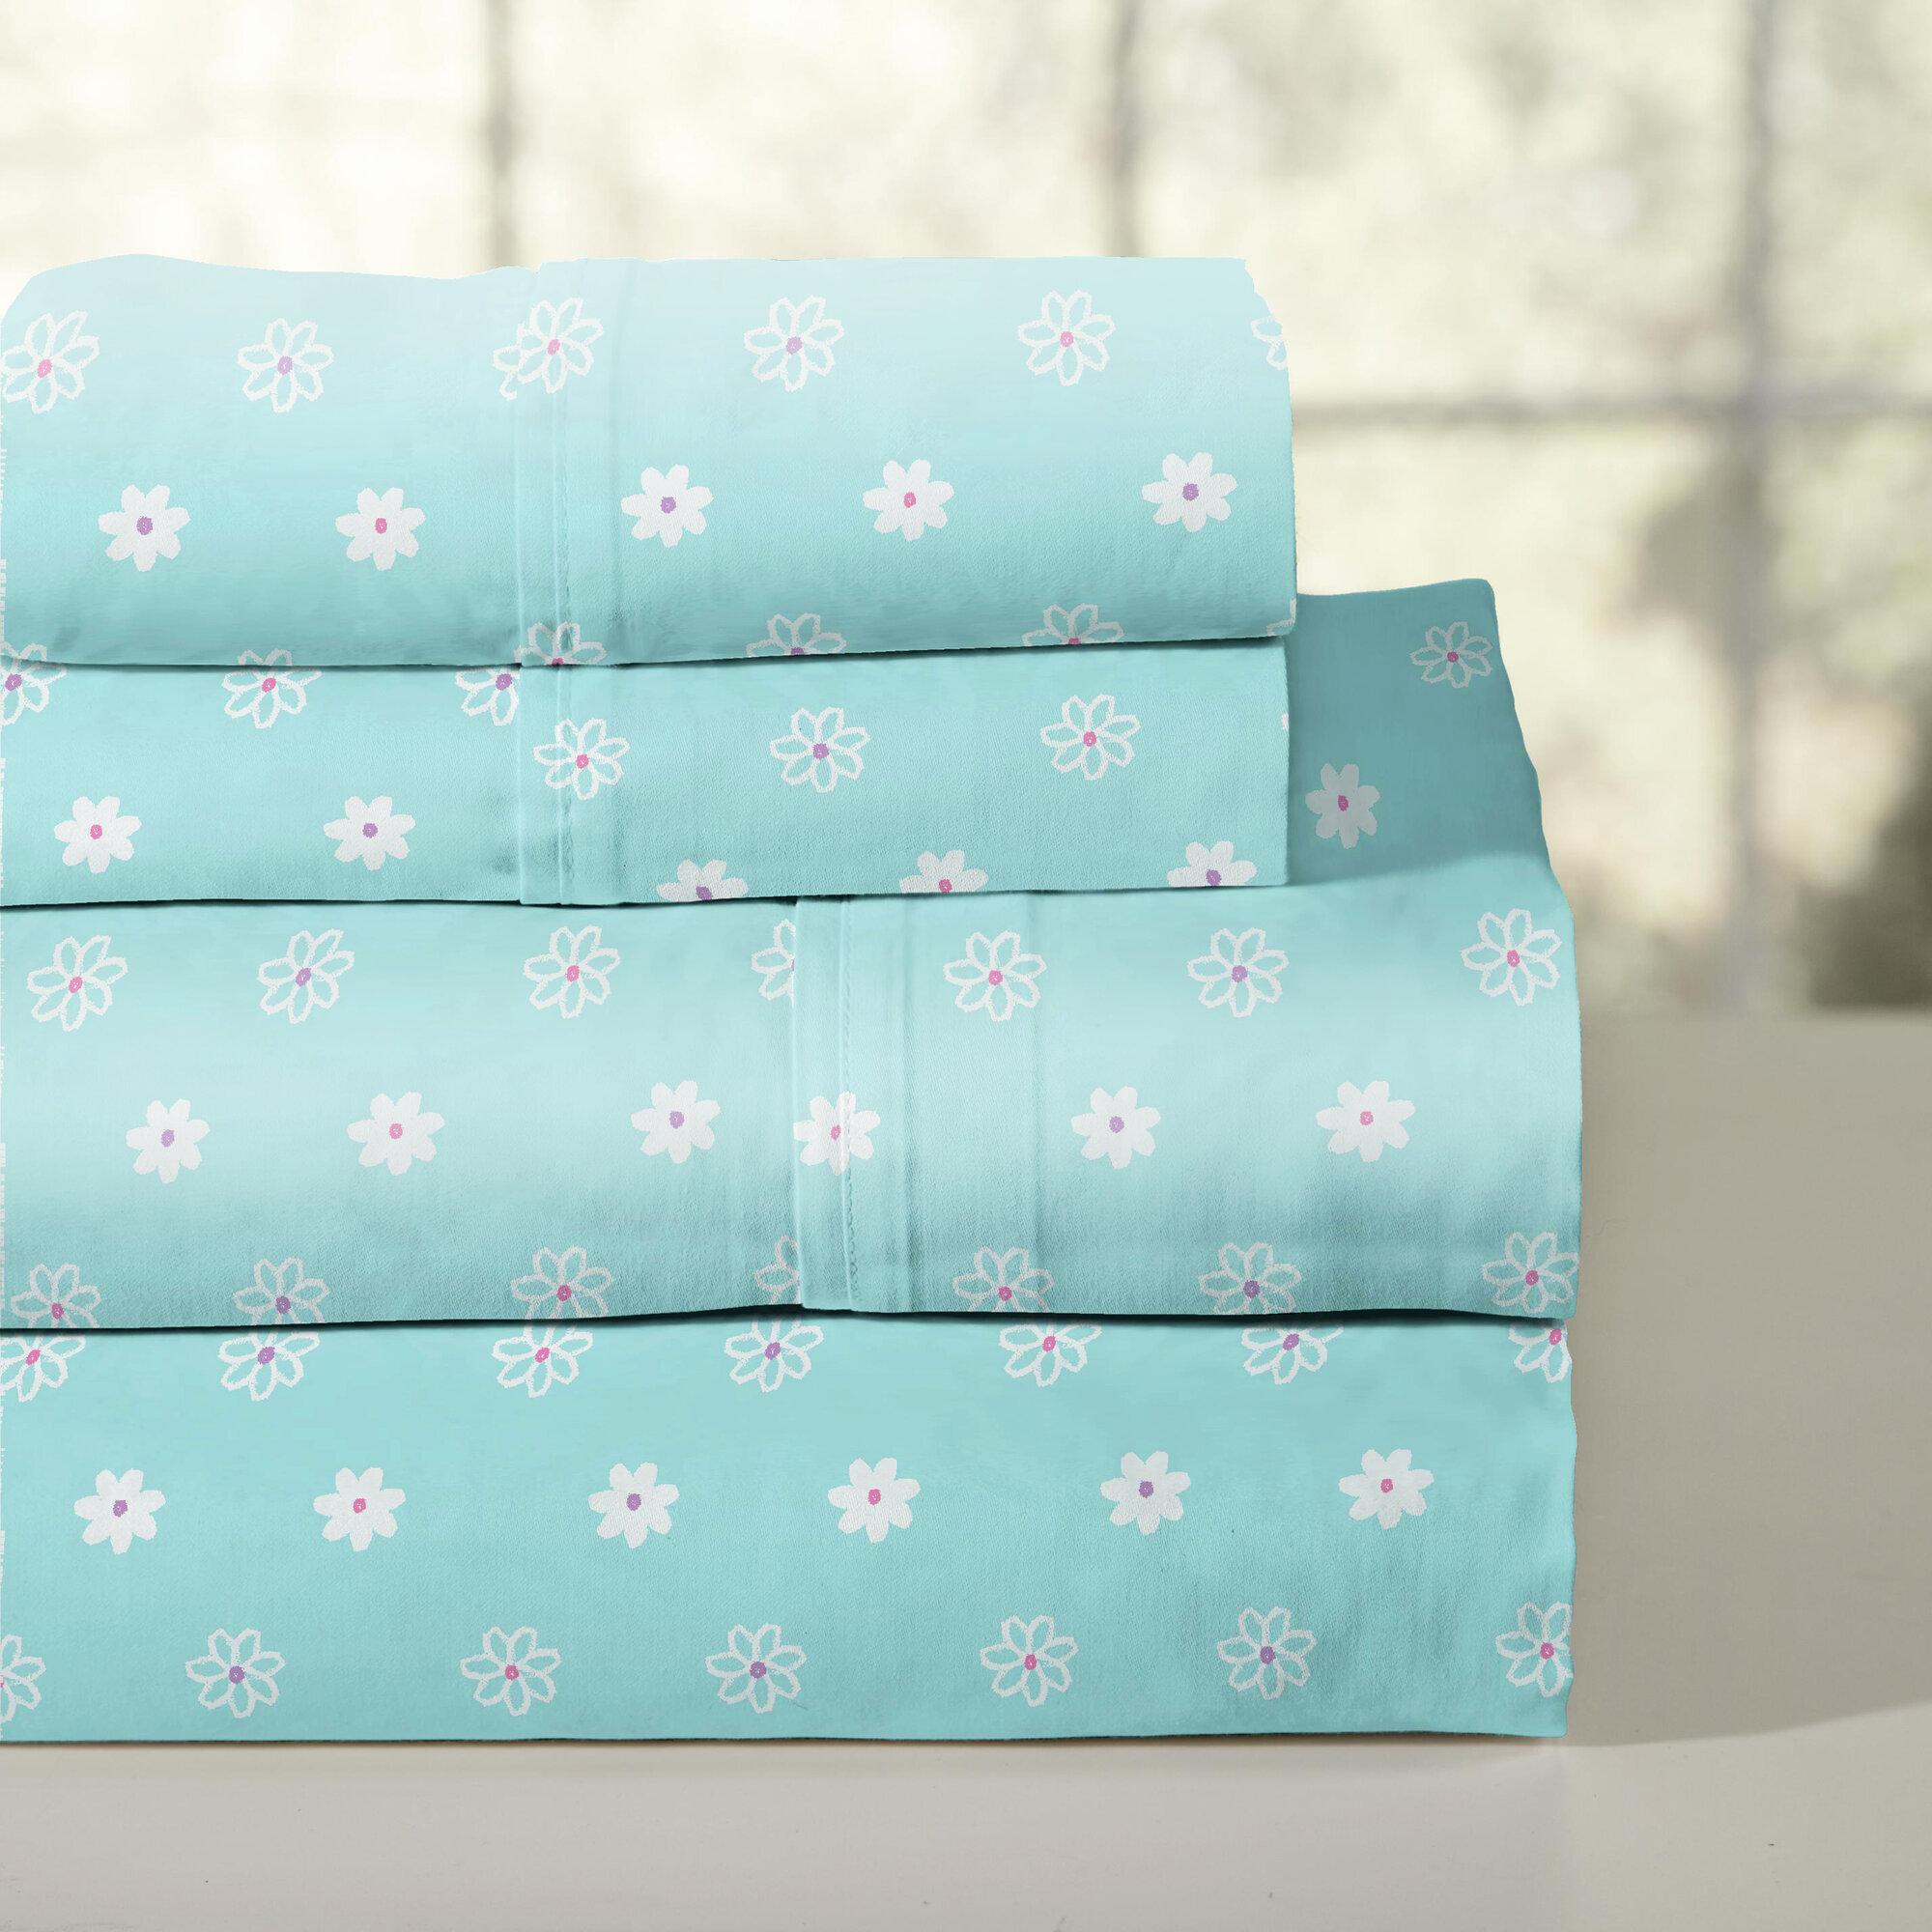 lullaby bedding 200 thread count 100 cotton sheet set ebay. Black Bedroom Furniture Sets. Home Design Ideas